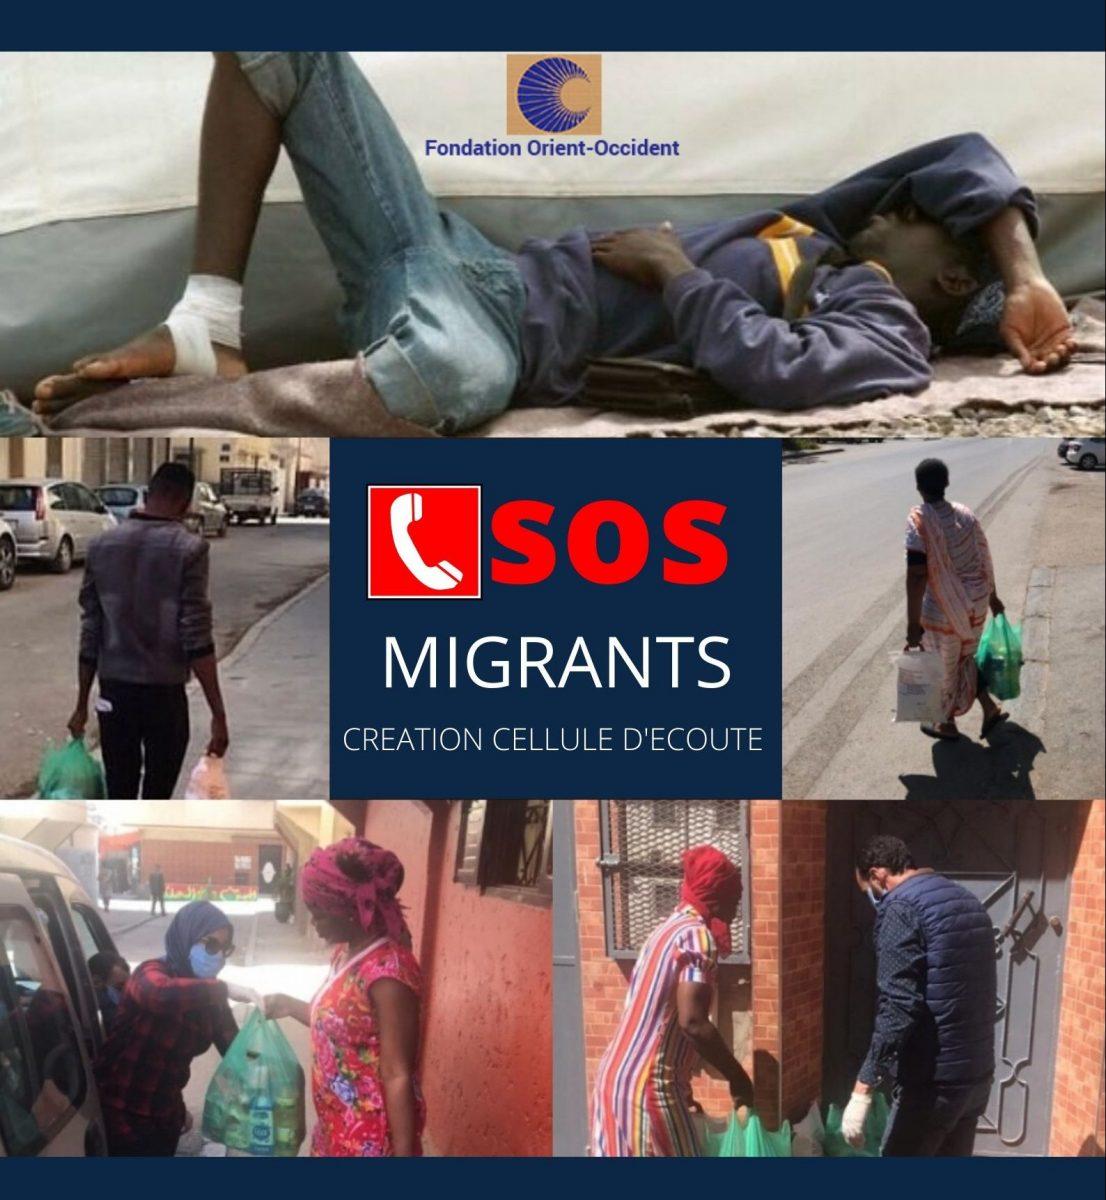 SOS Migrants – Food distribution, important information